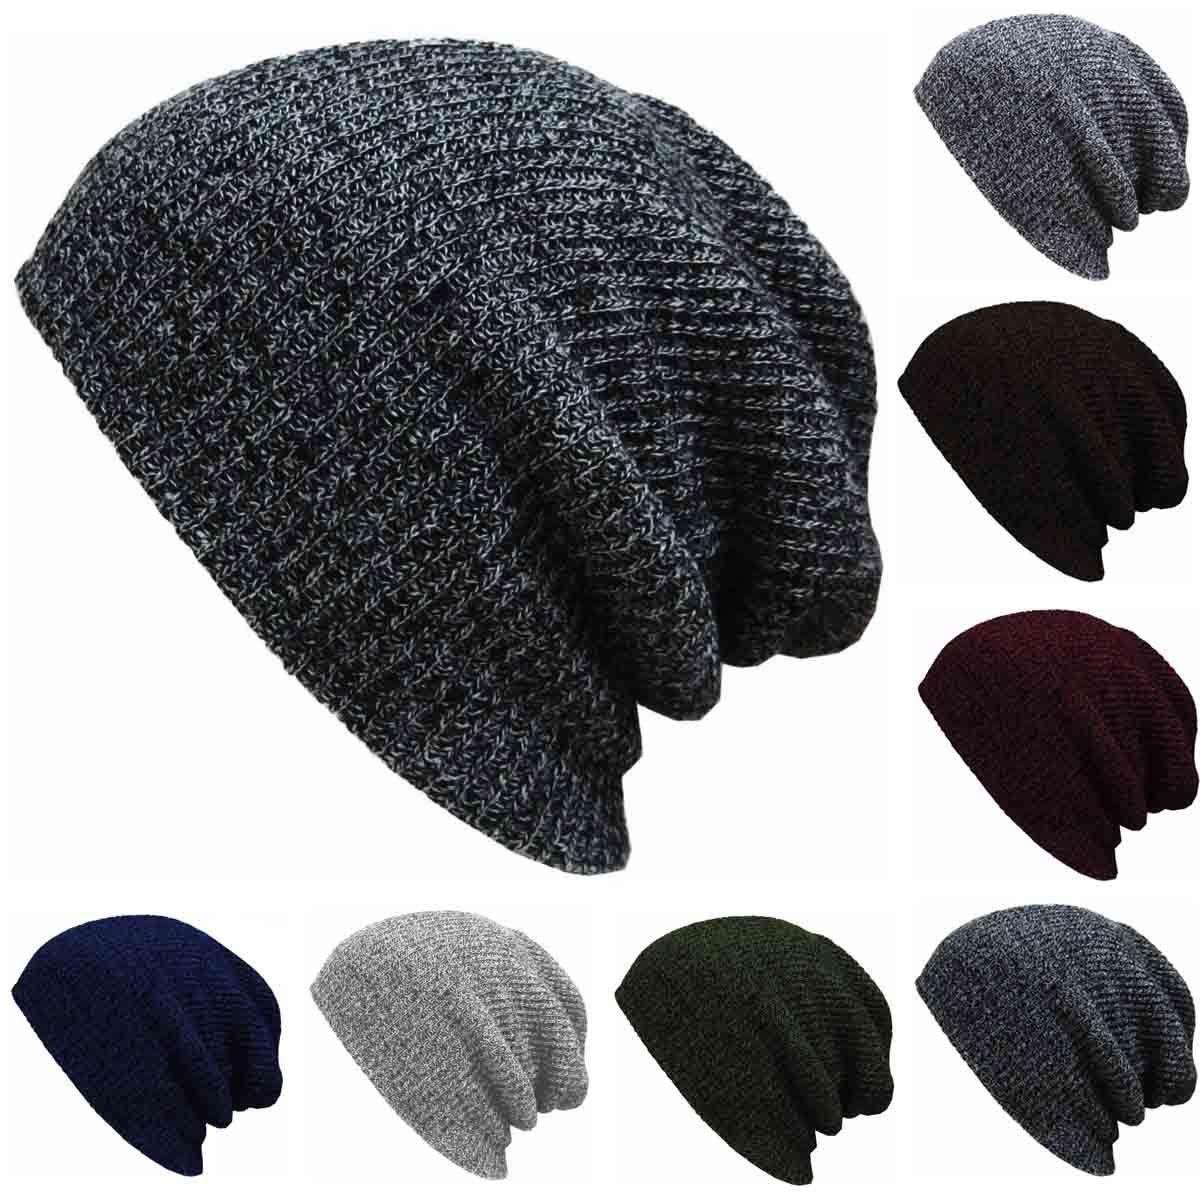 86c99dfffe68b Autumn Winter Men Slouch Skull Oversize Long Beanie Women Baggy Cap Crochet Knit  Ski Hat